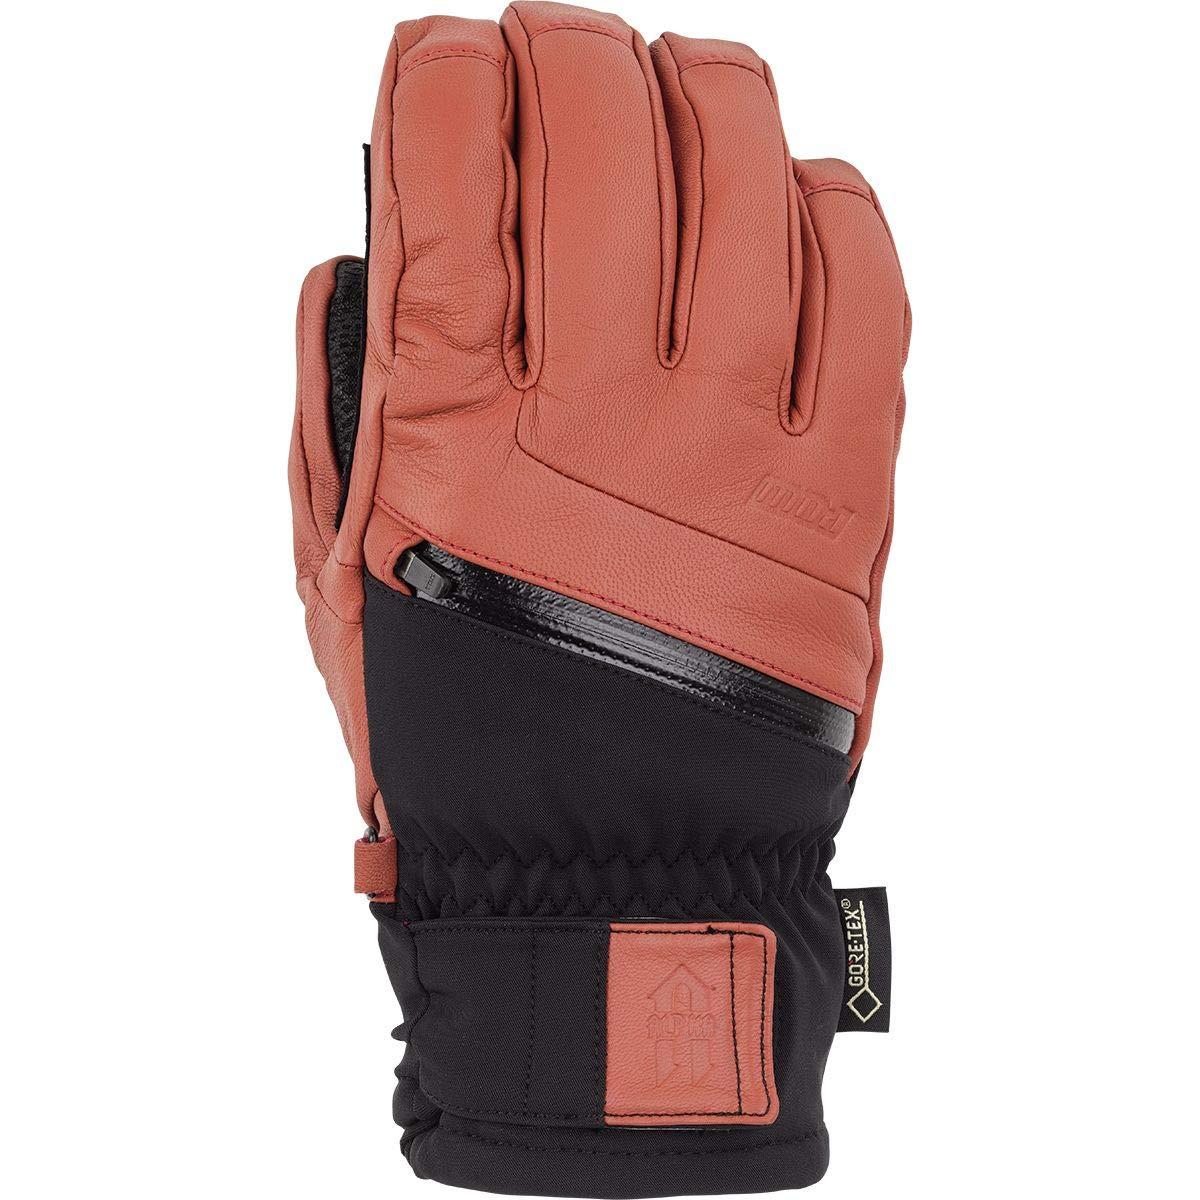 Pow Gloves Alpha GTX Glove - Men's Auburn, S by Pow Gloves